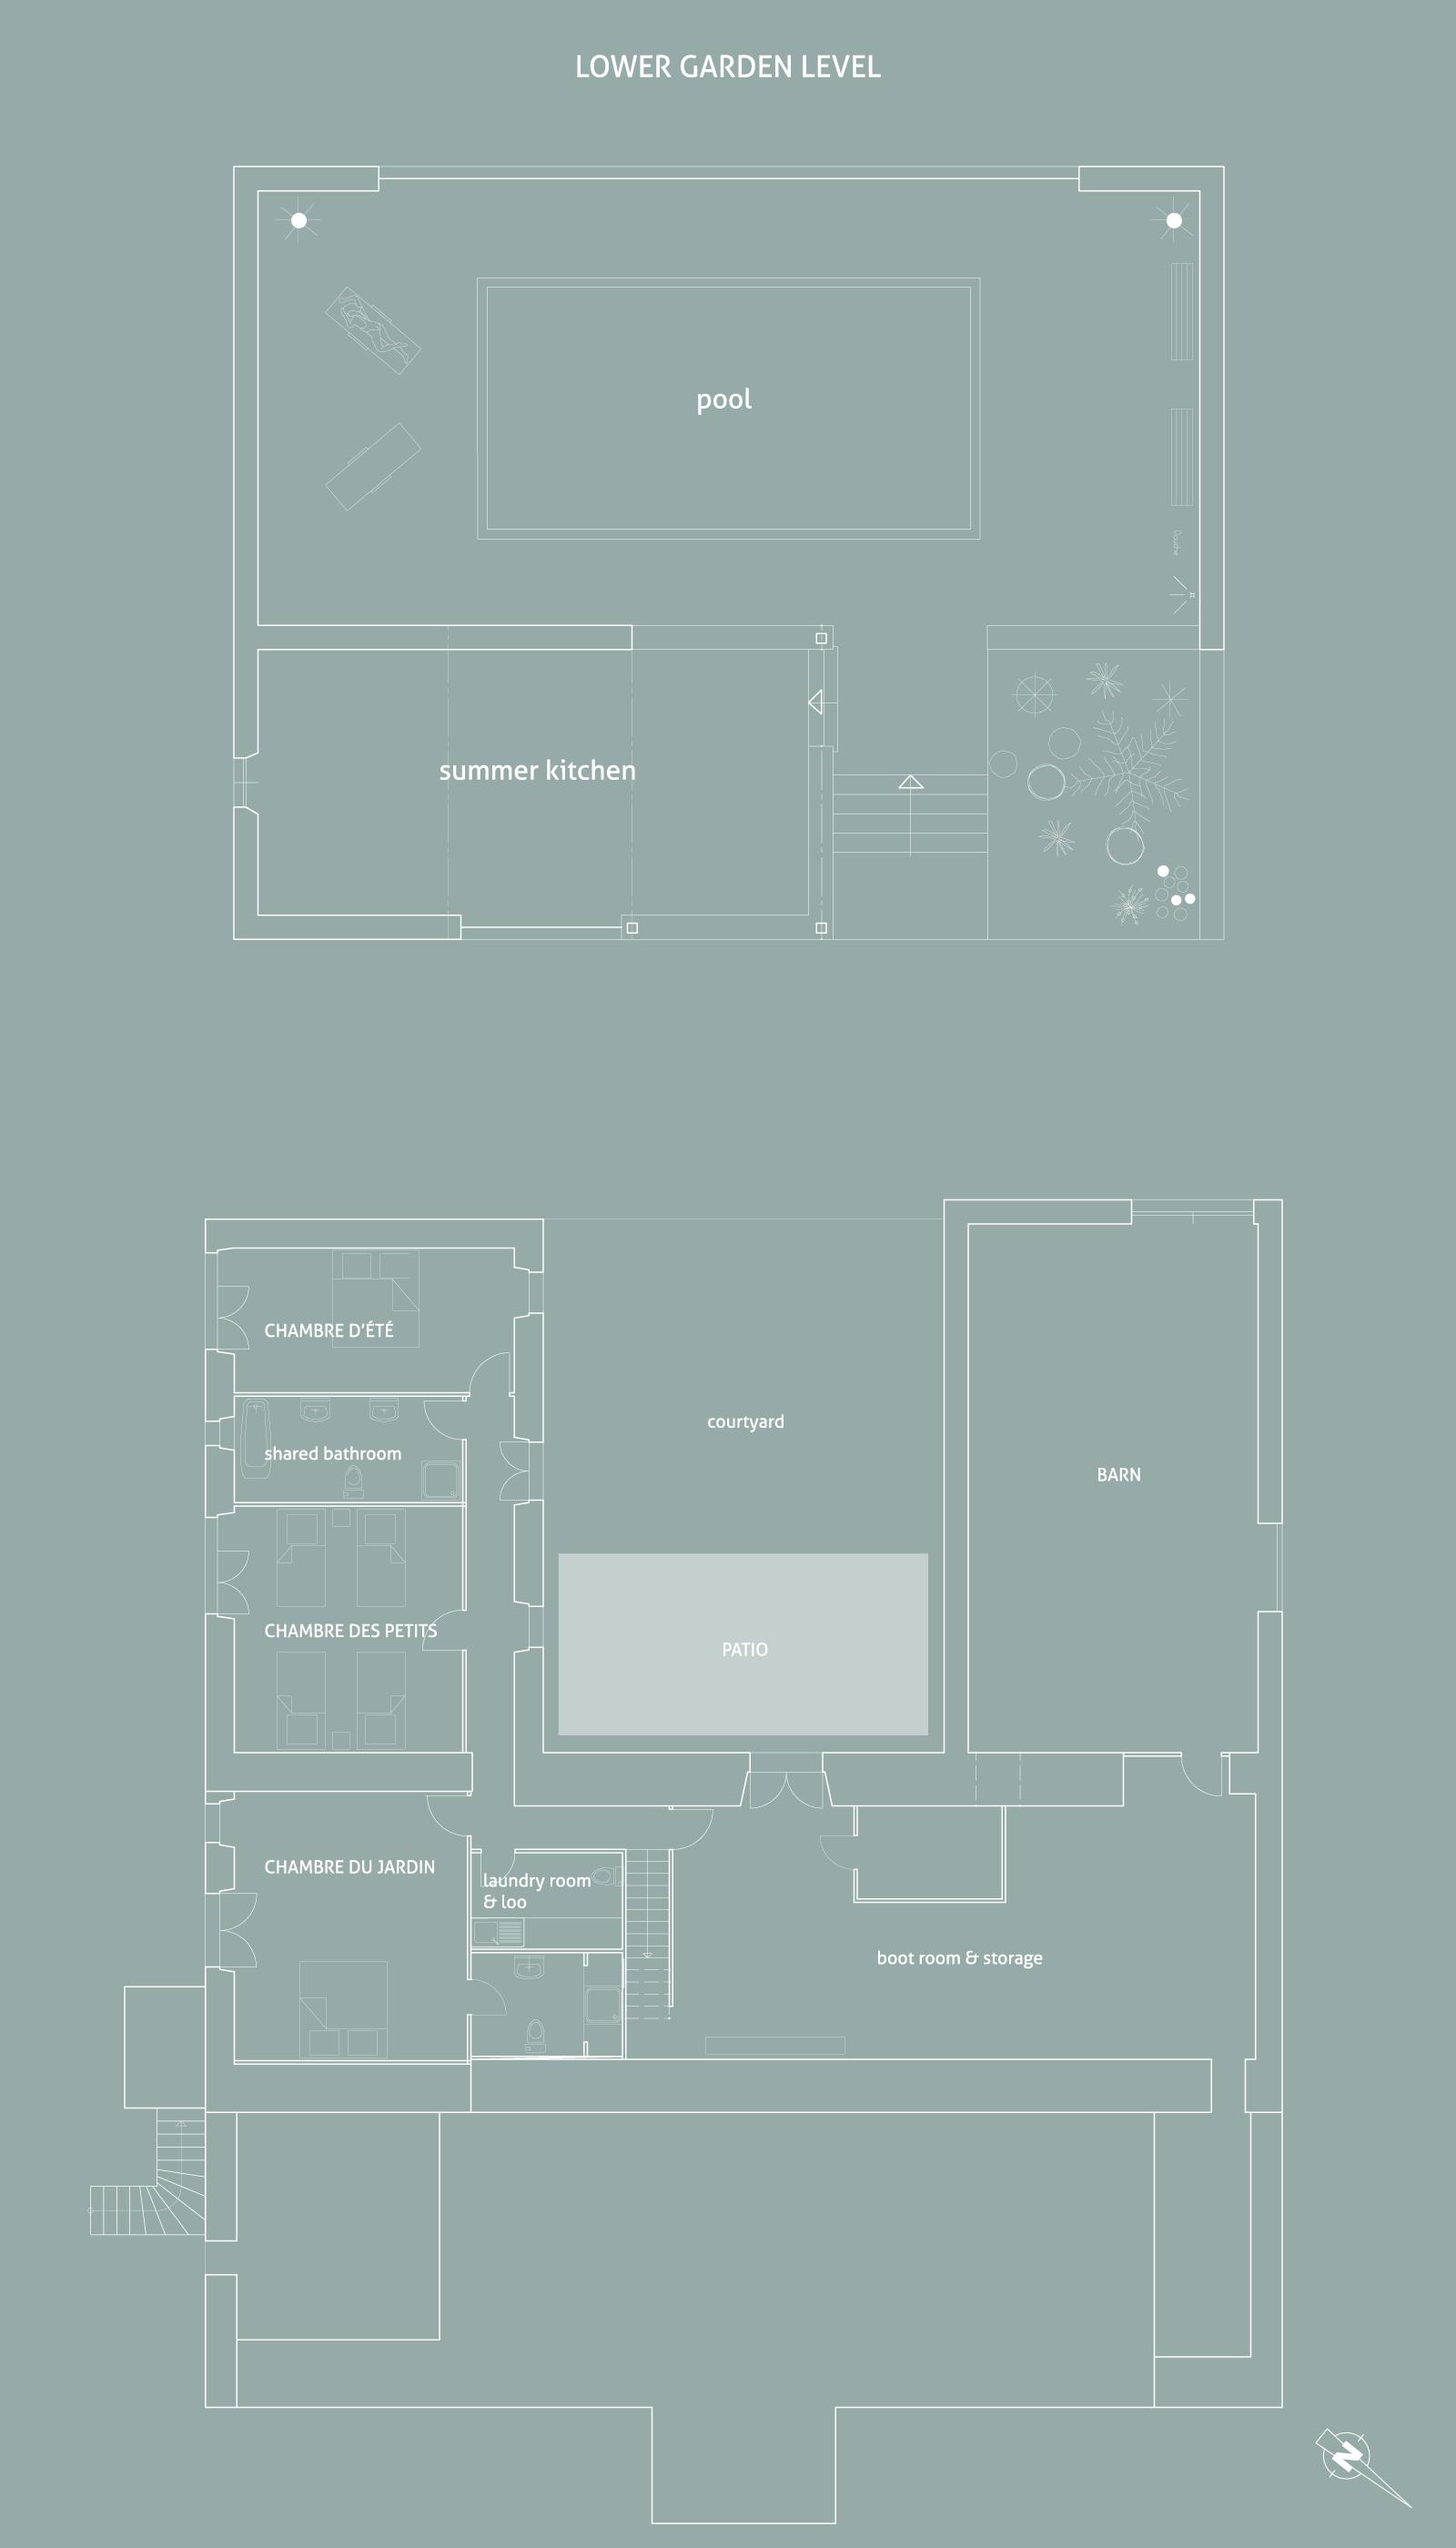 Last lower level plan